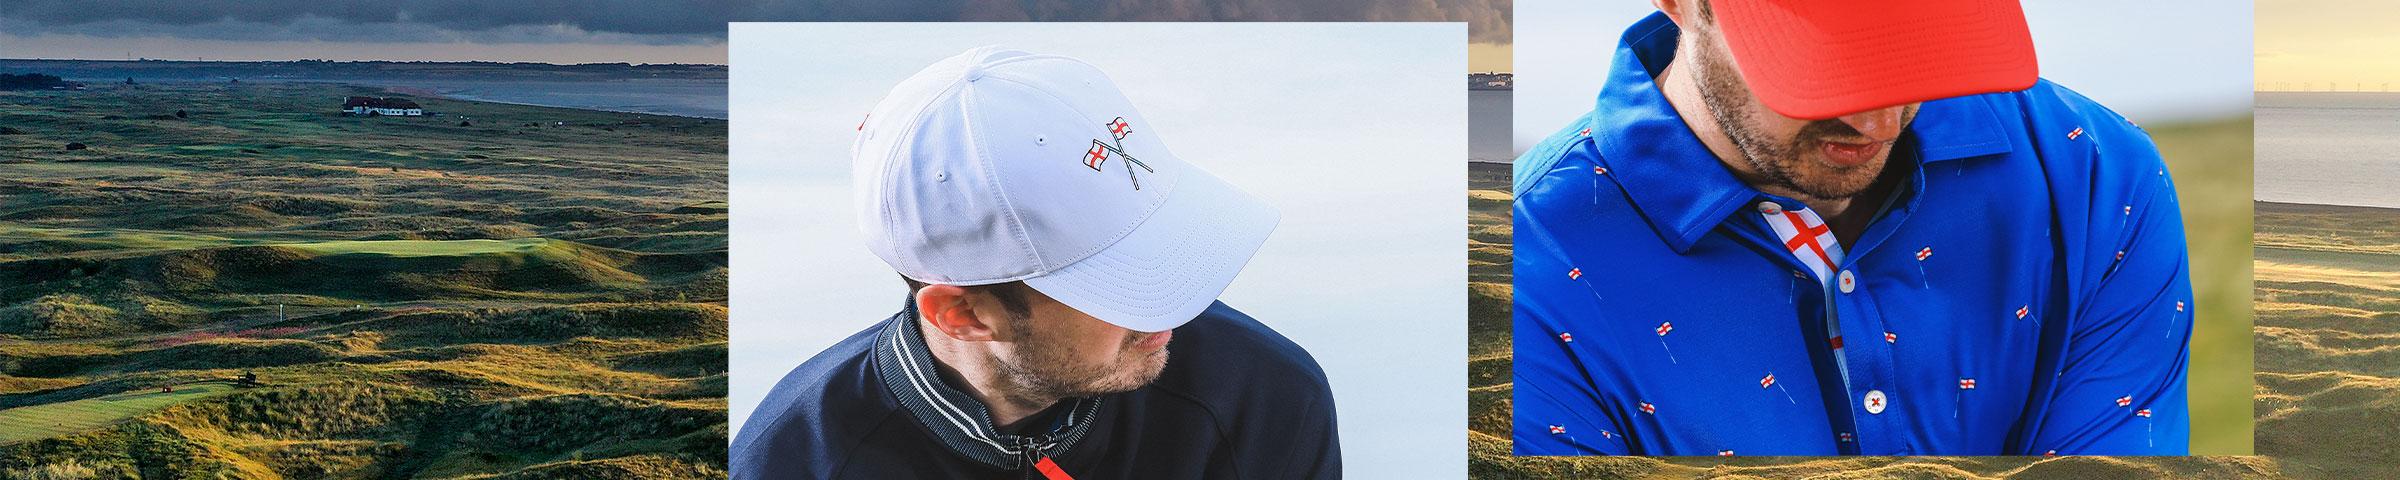 FootJoy Men's Golf Apparel